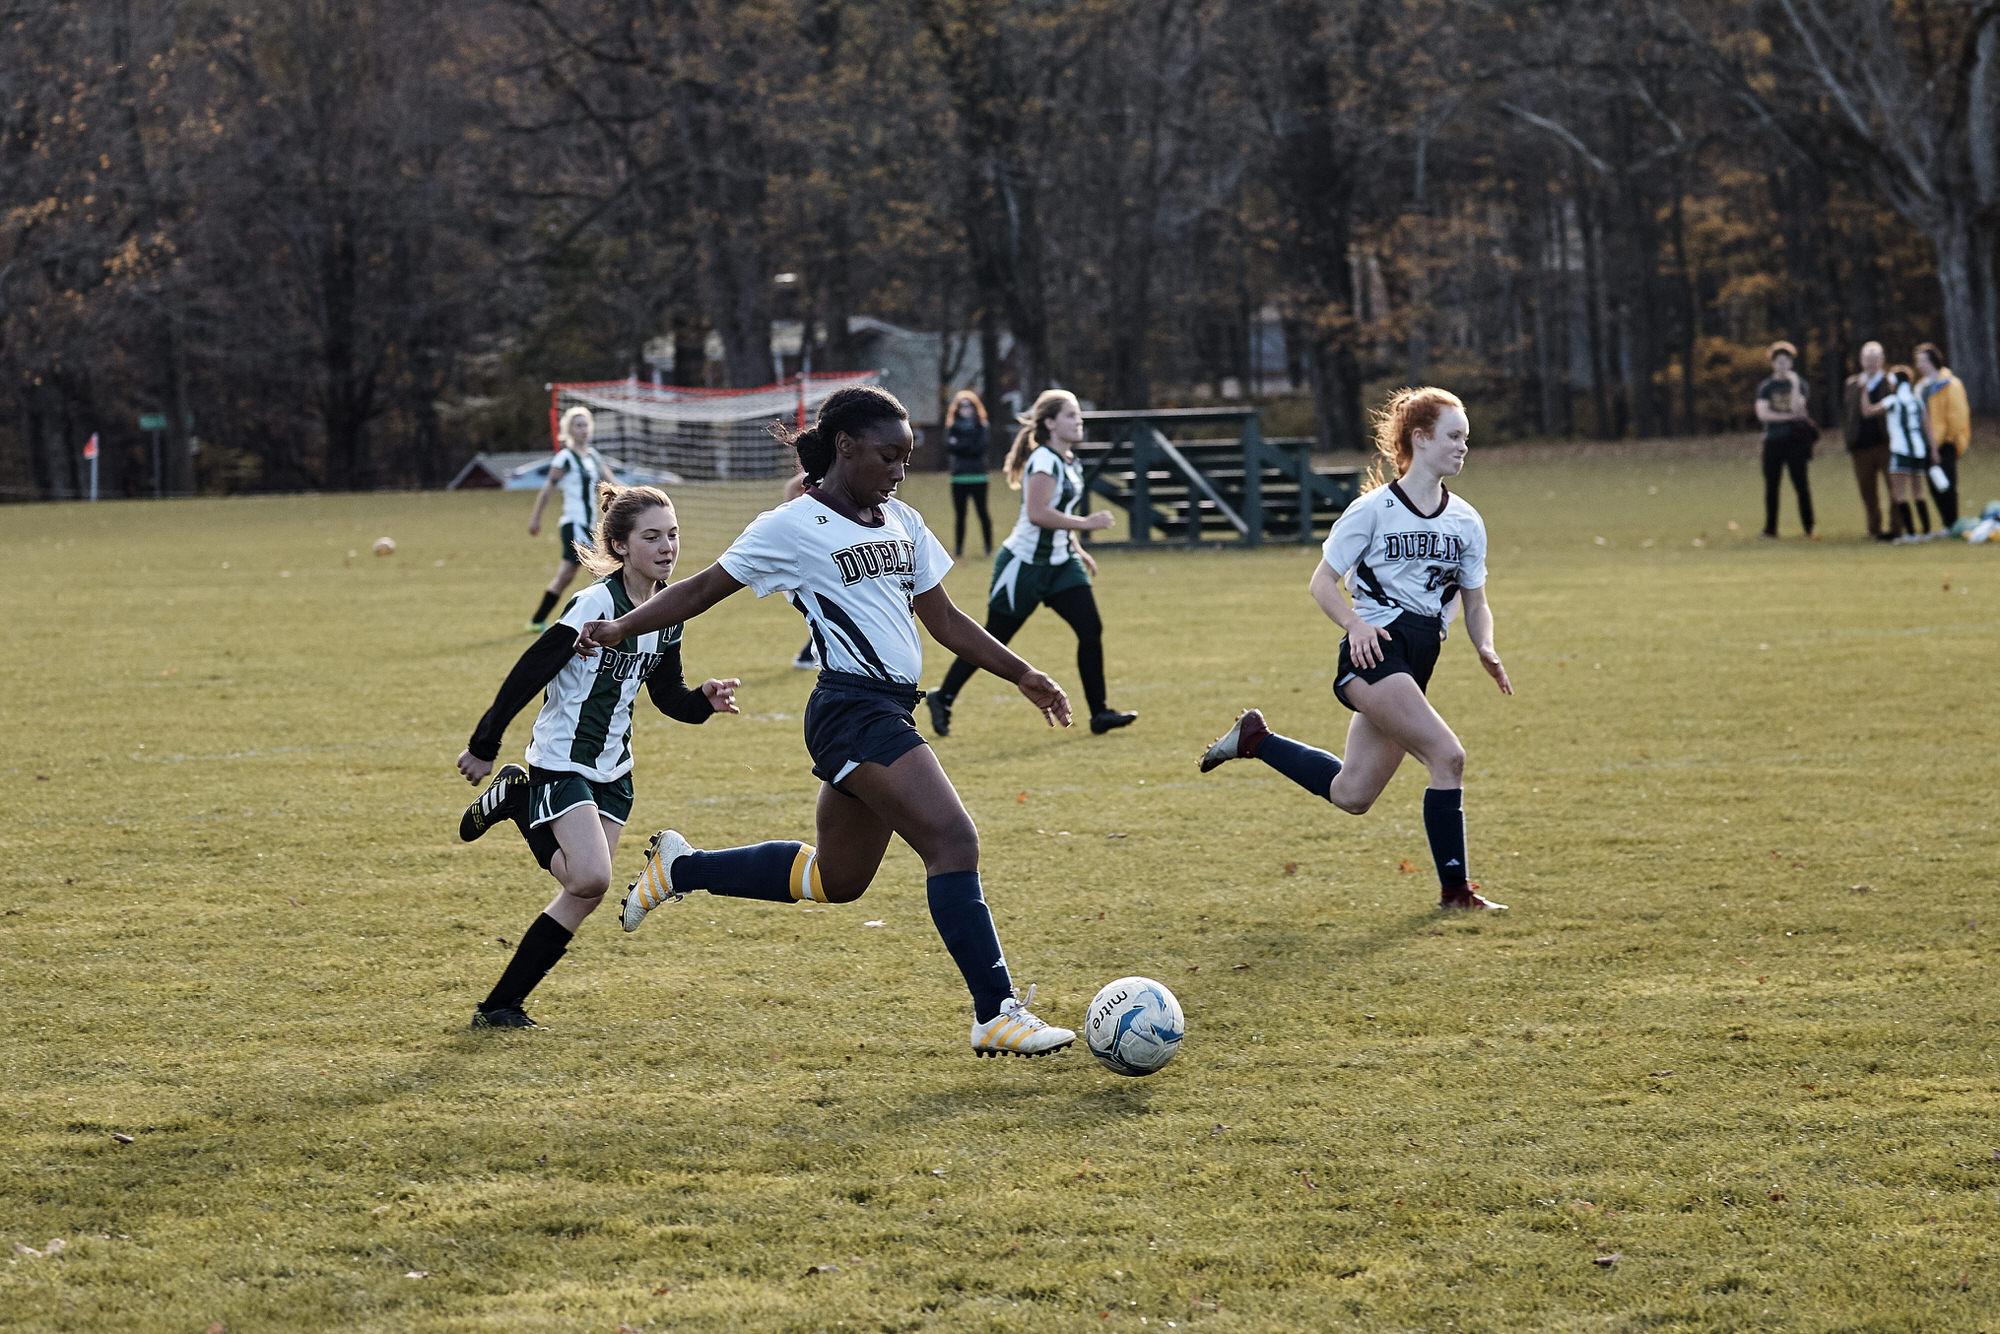 Girls Varsity Soccer vs. Putney School - October 26, 2018 - 039.jpg